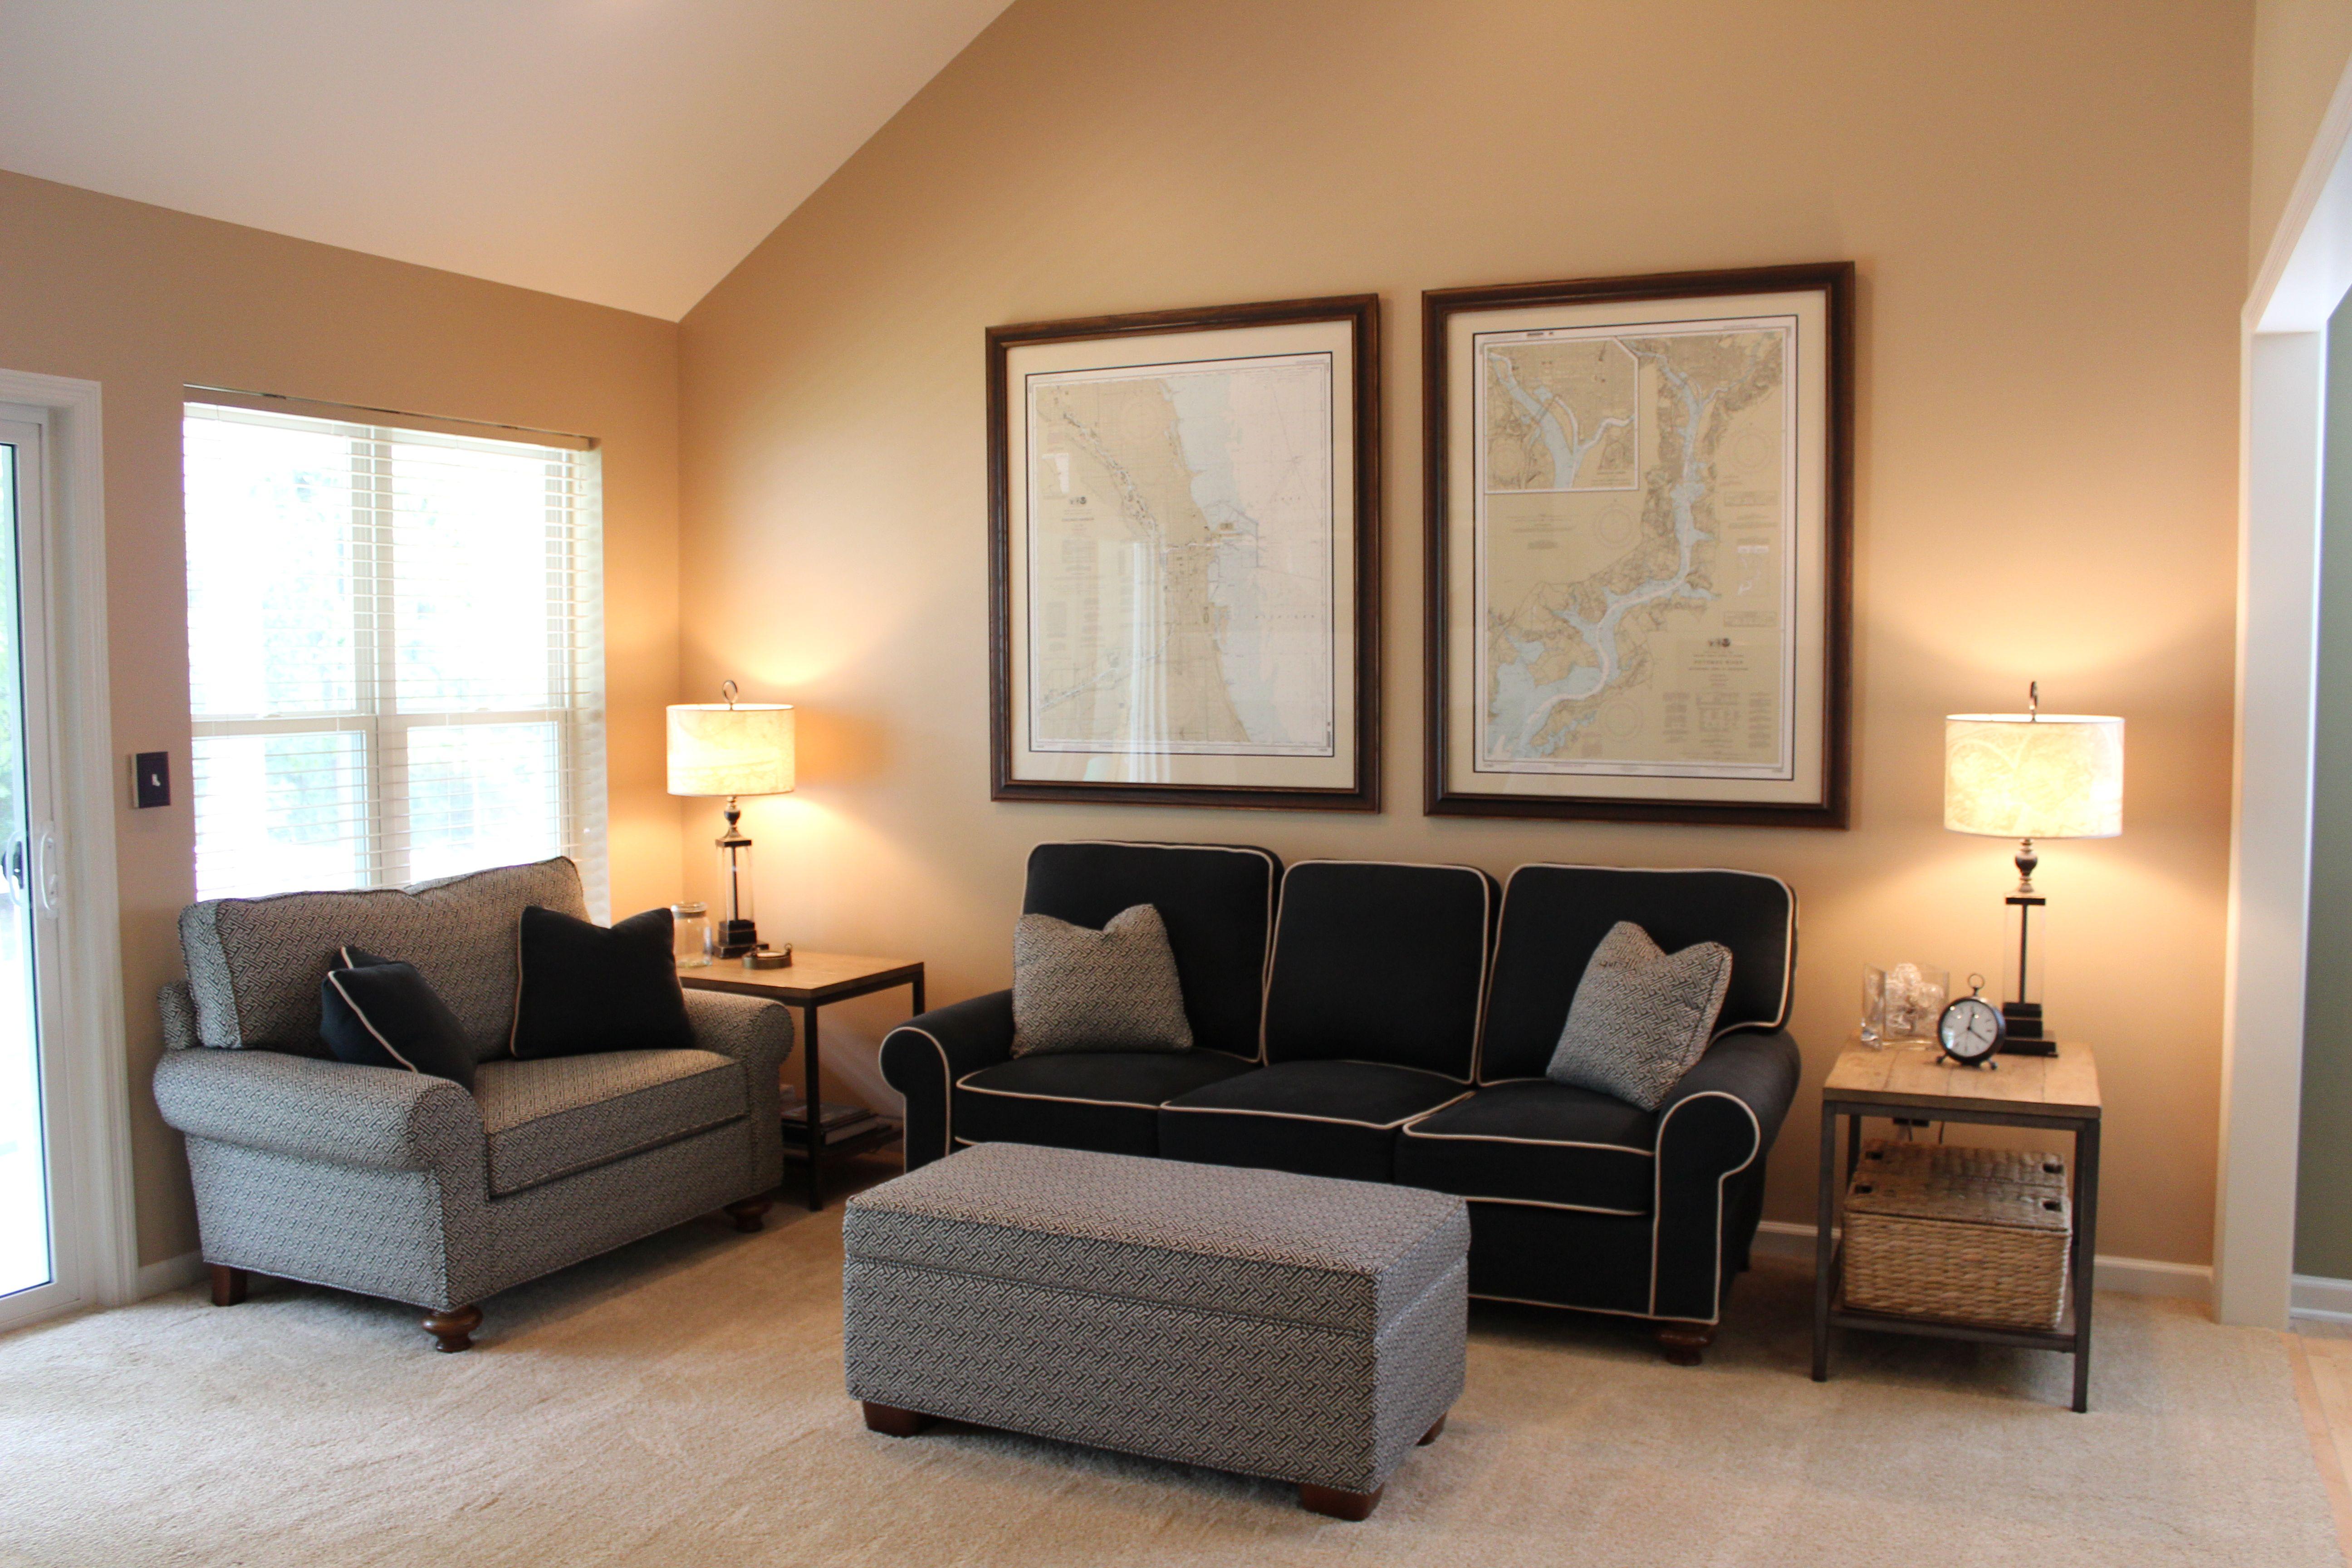 paint for living room colors acnn decor. Black Bedroom Furniture Sets. Home Design Ideas